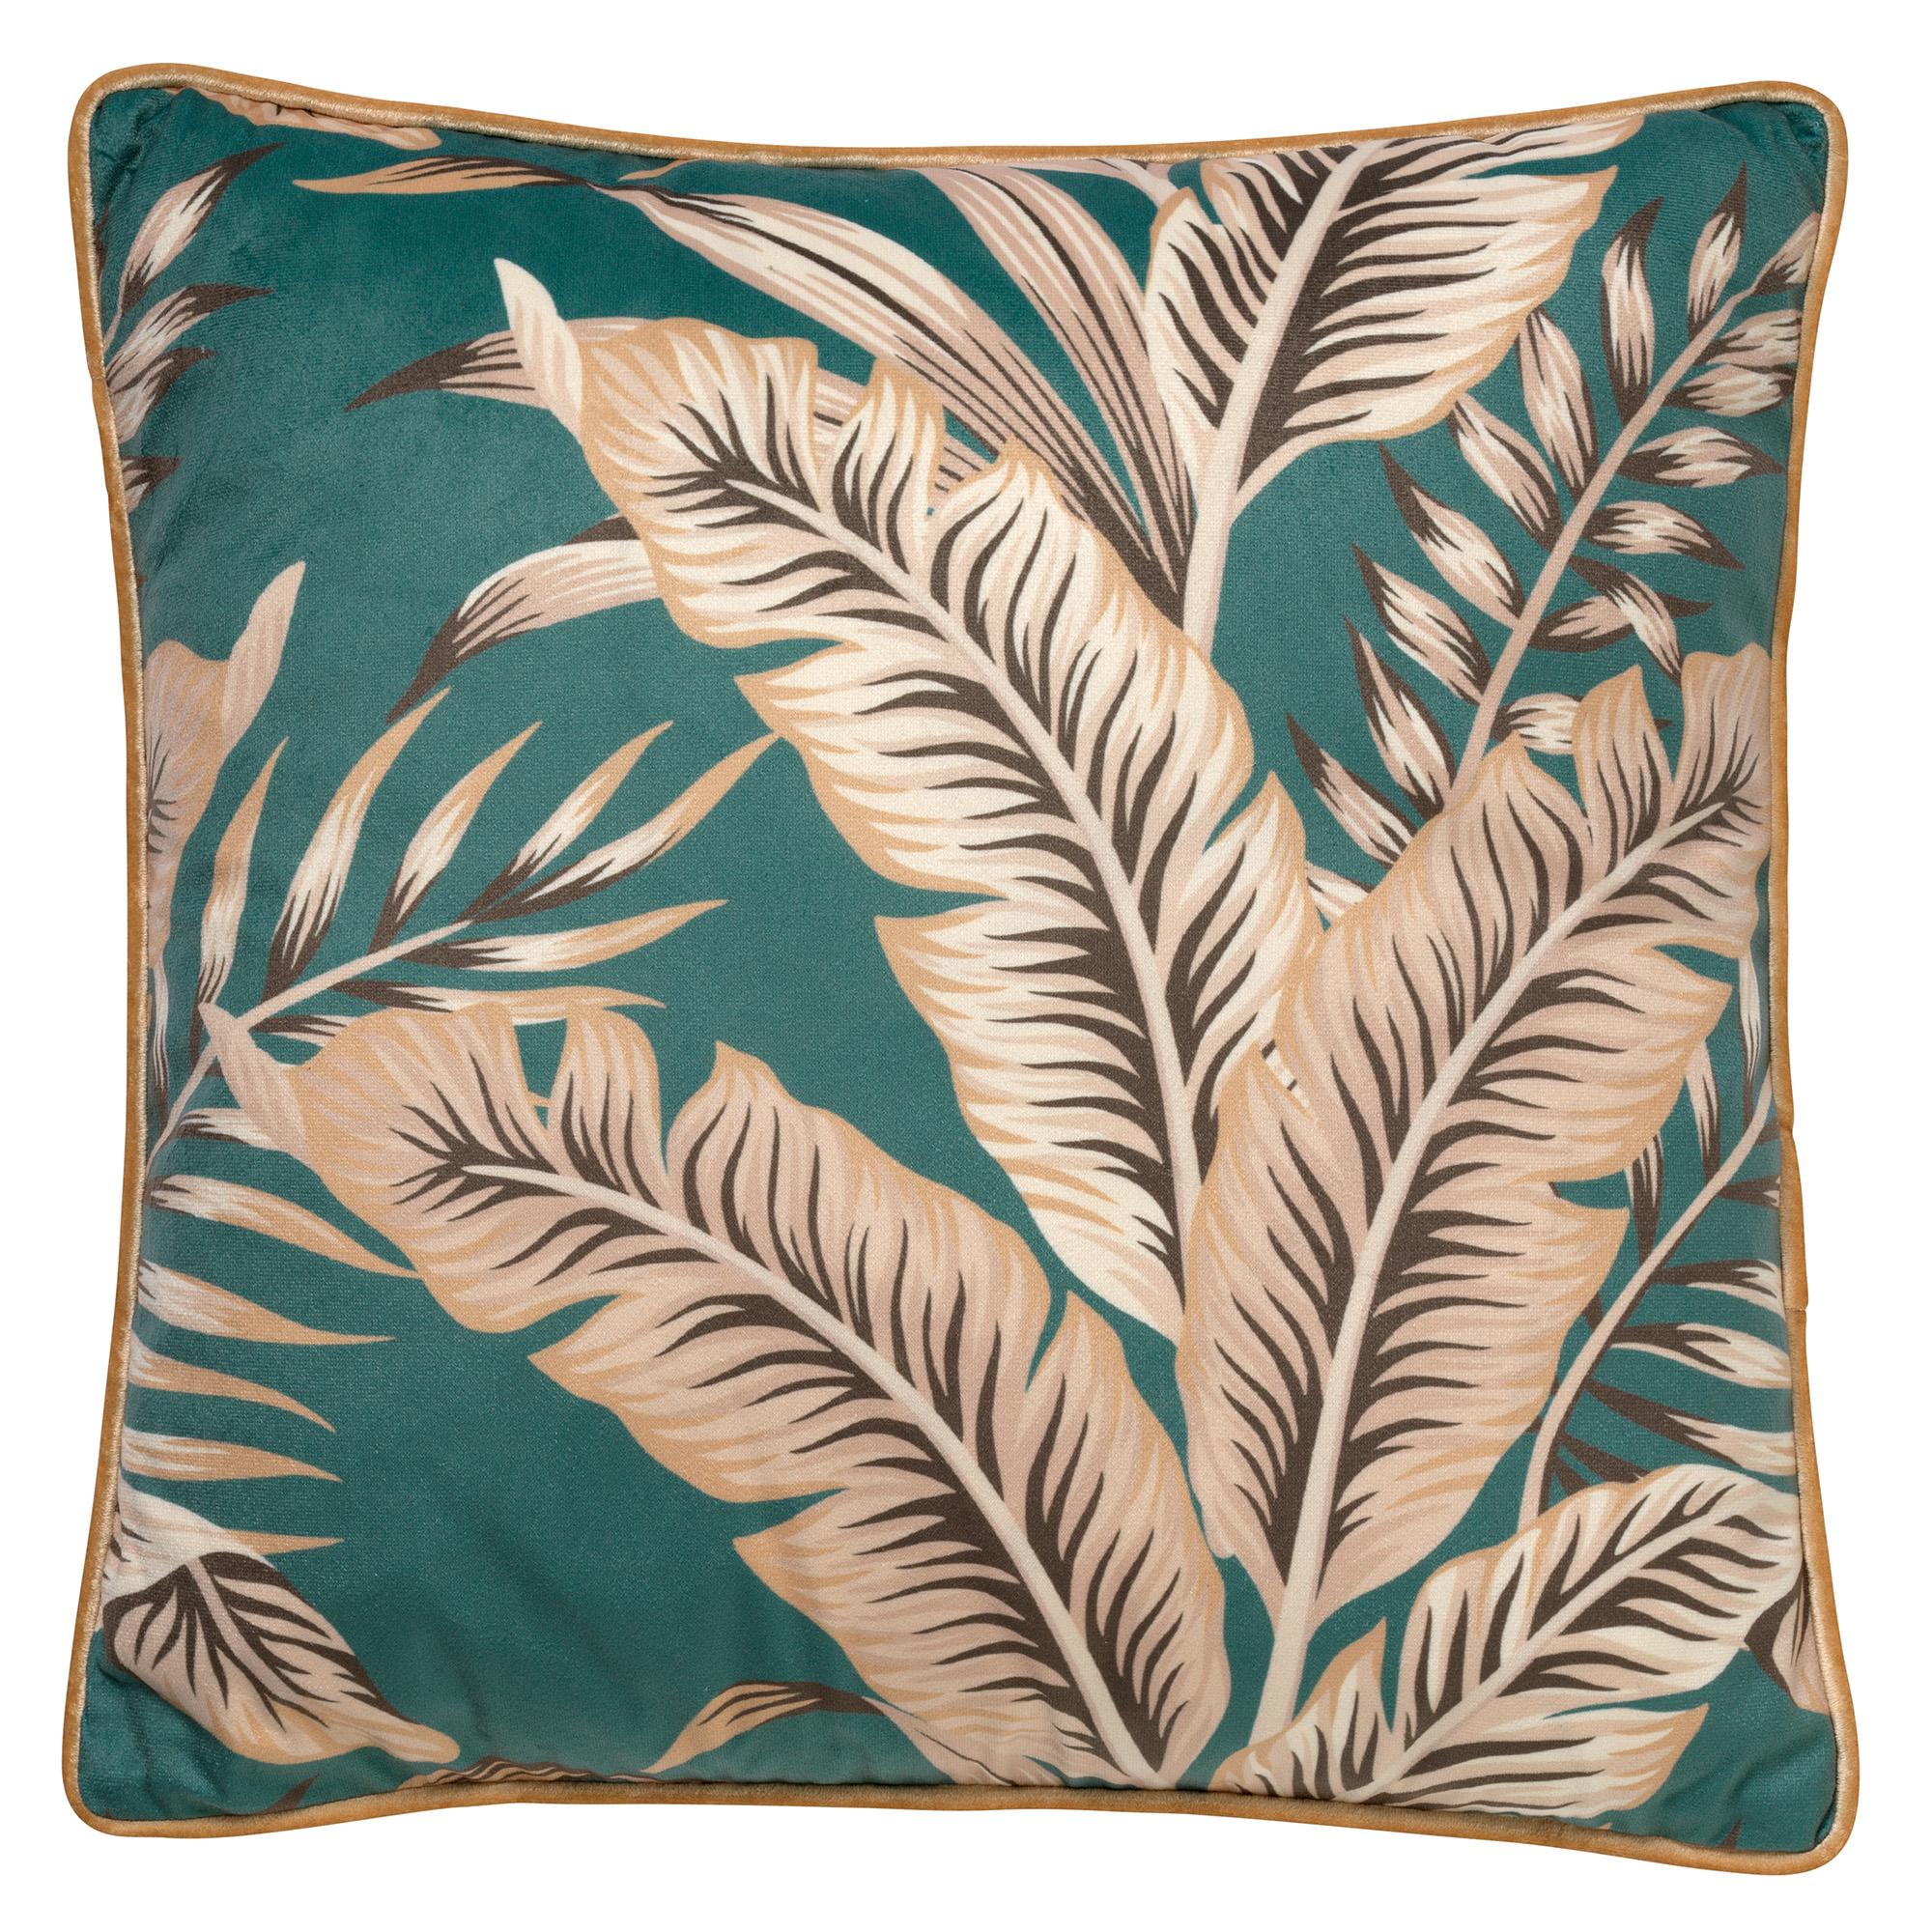 PALMER - Sierkussen velvet Sagebrush Green 45x45 cm